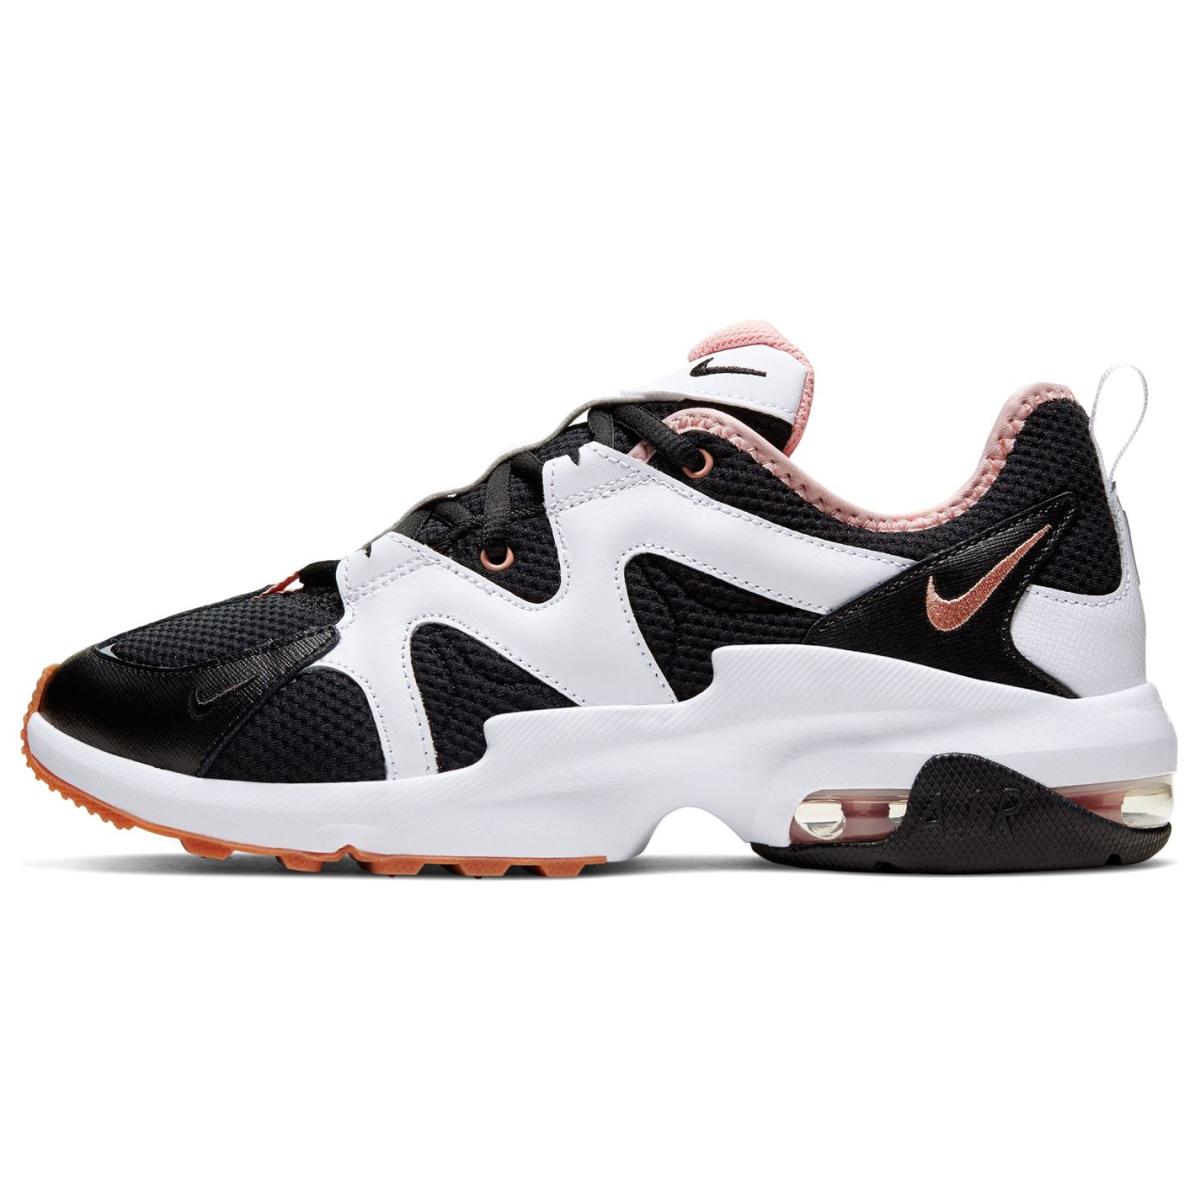 Nike-Air-Max-Graviton-Turnschuhe-Damen-Sneaker-Sportschuhe-Laufschuhe-4069 Indexbild 4